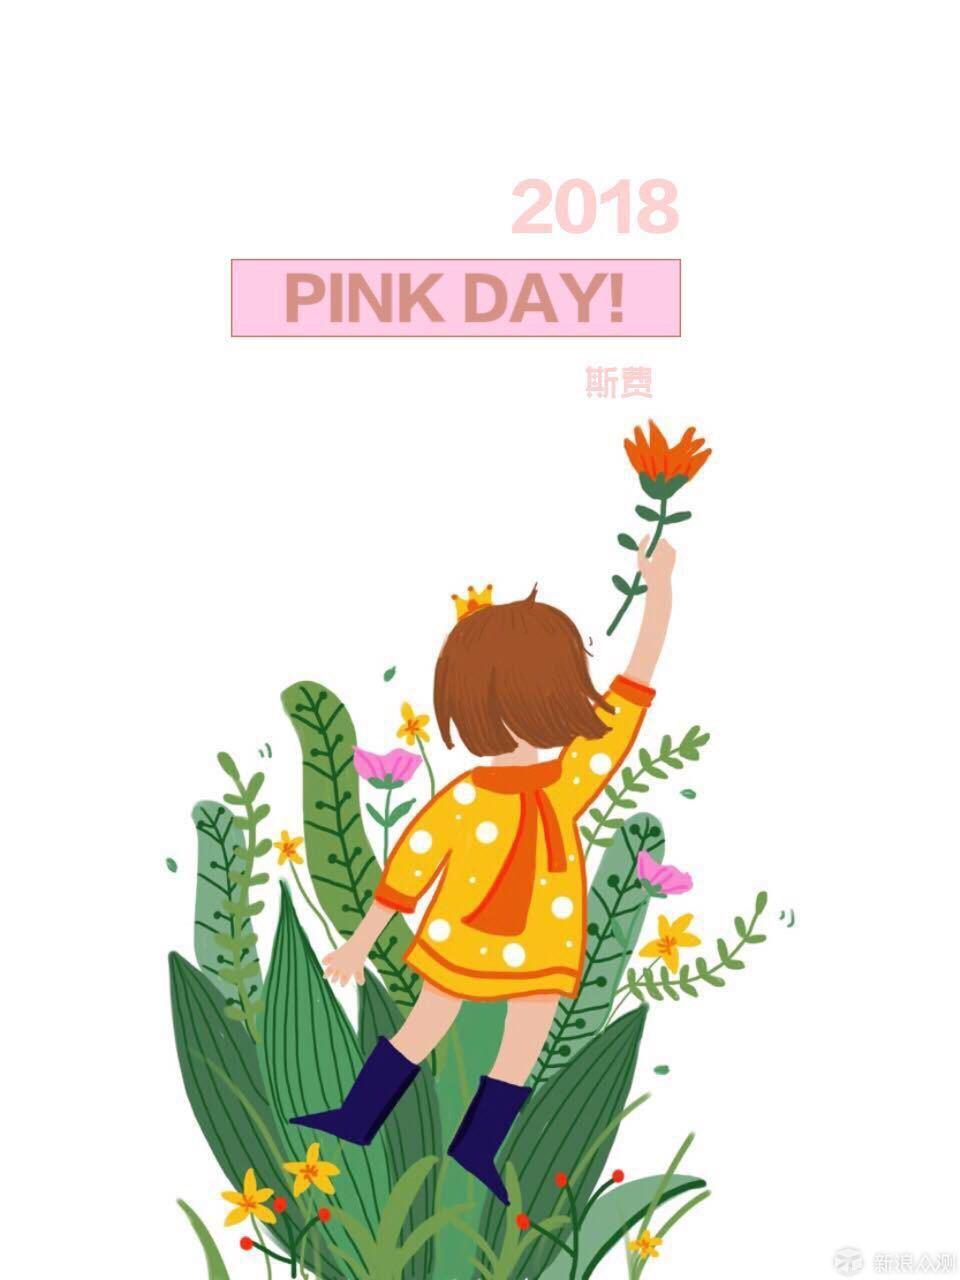 pink day|一个女王节的水彩过程_新浪众测